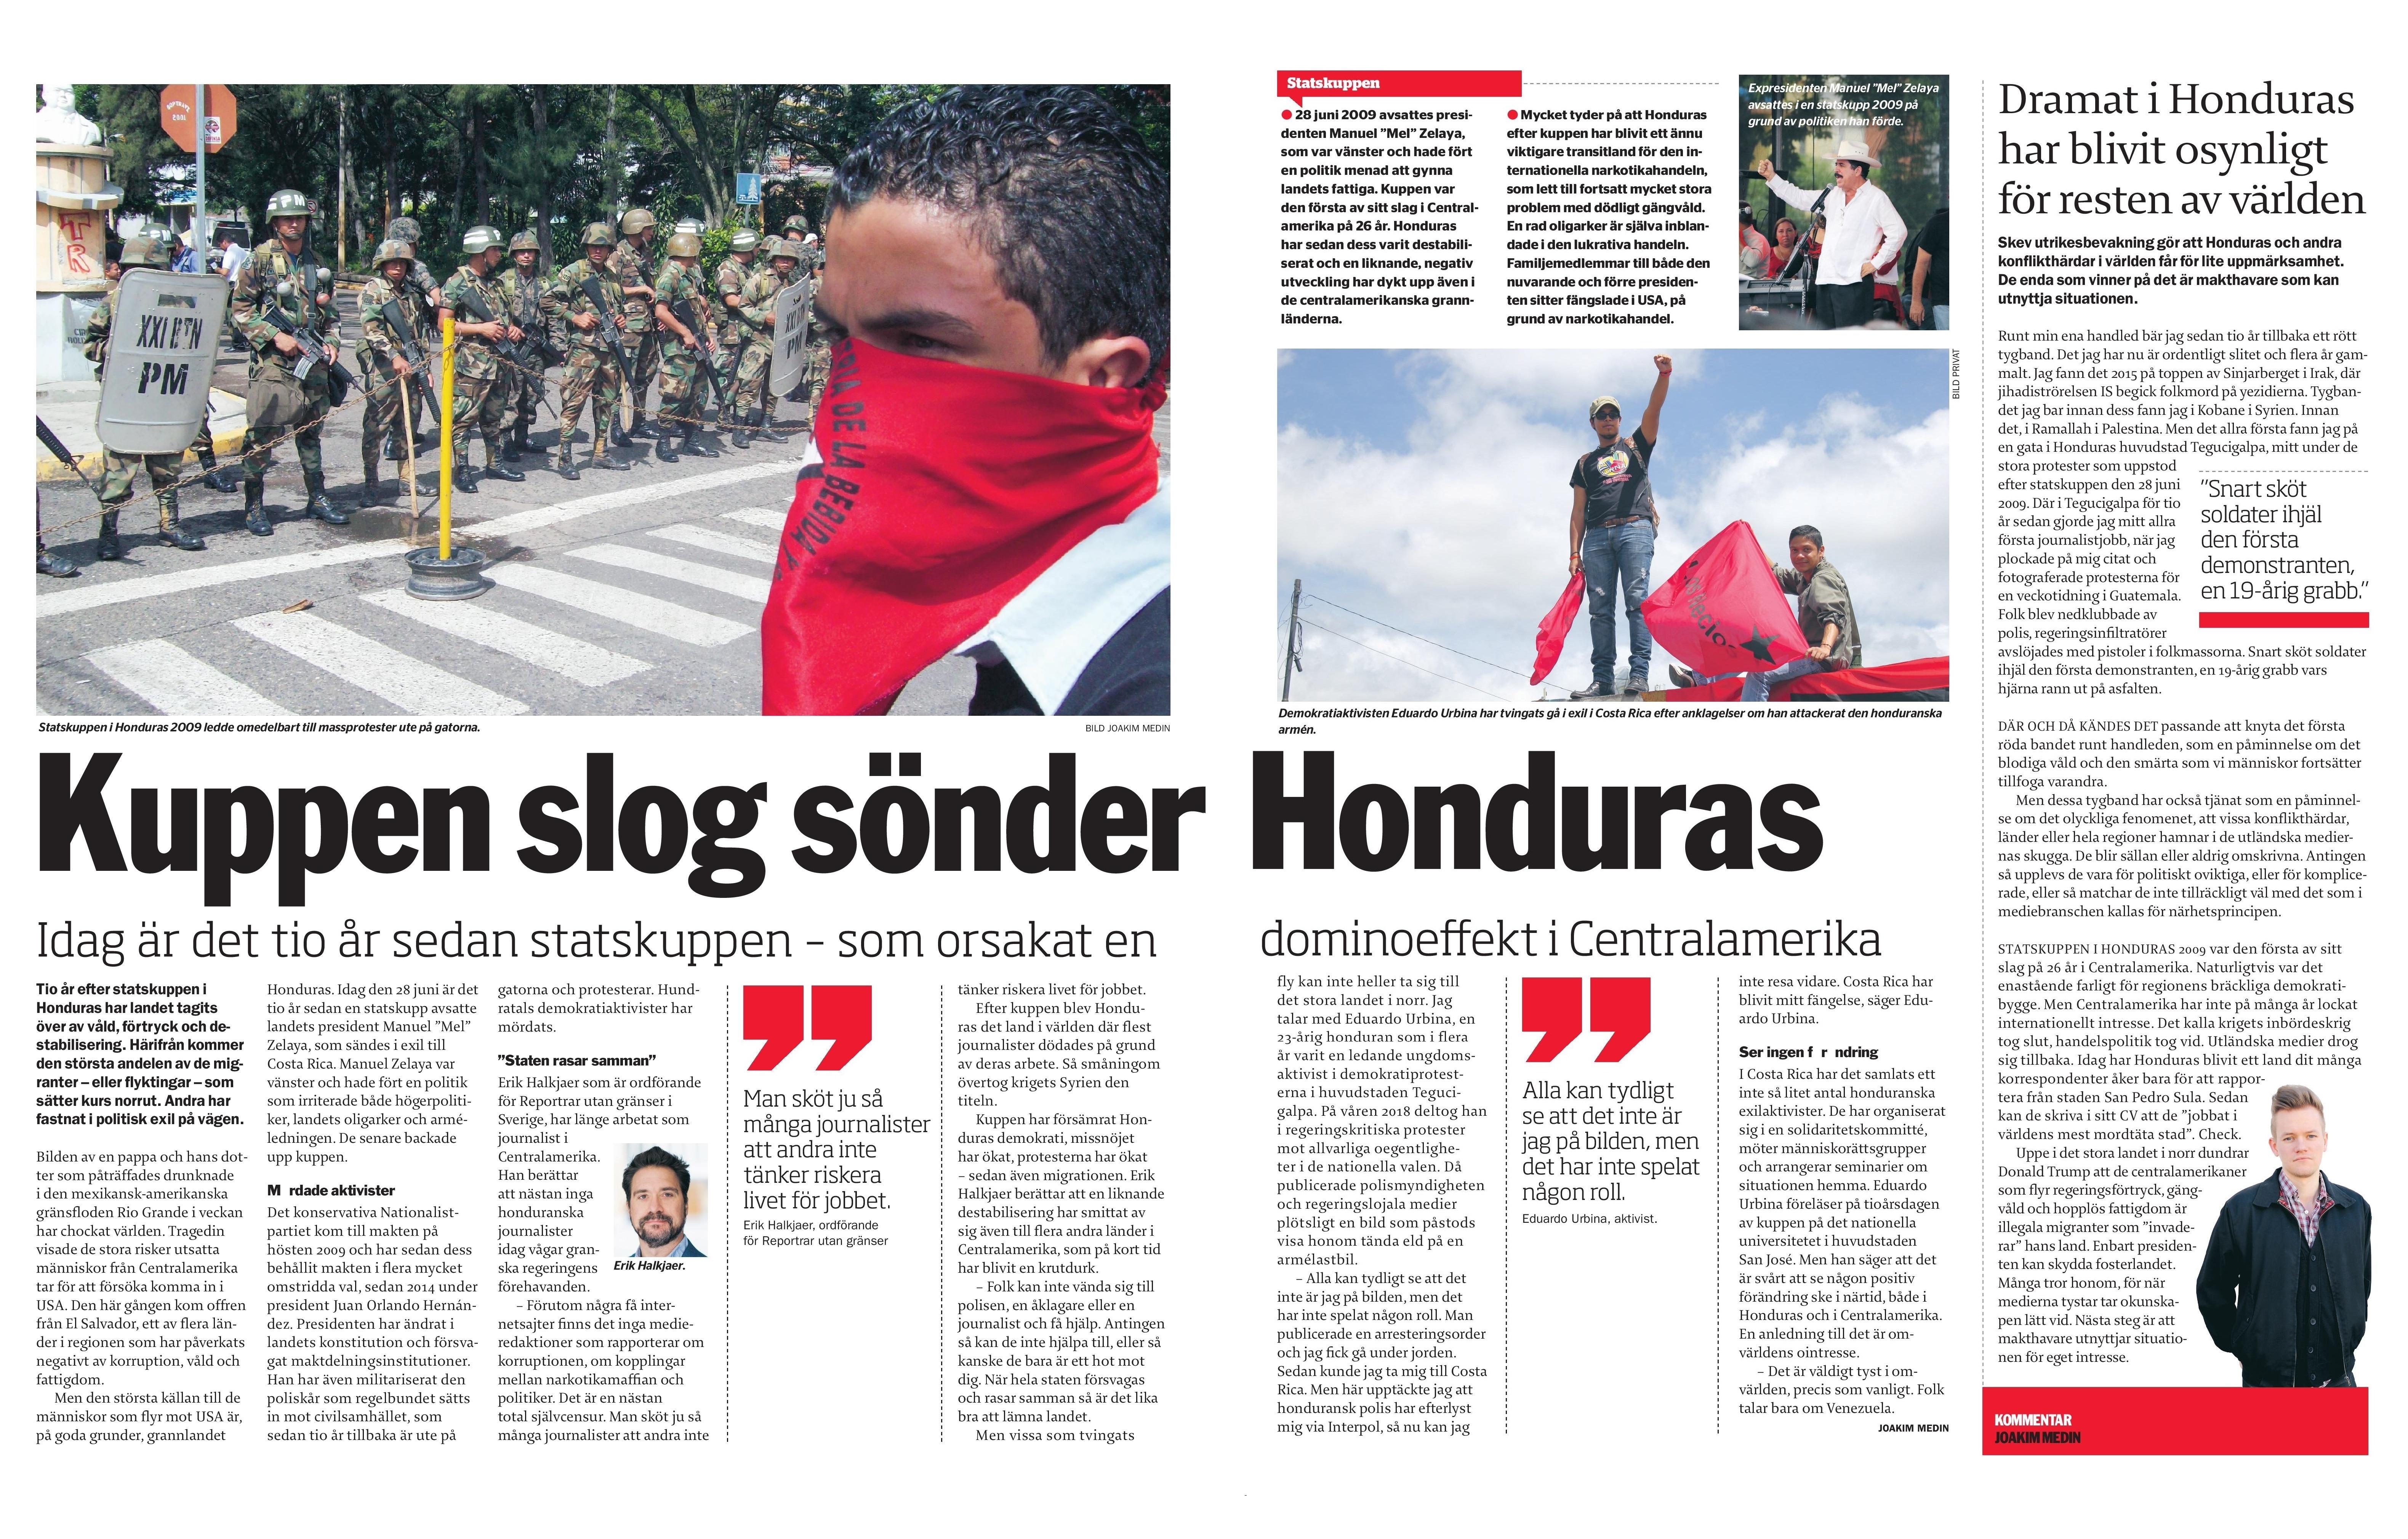 Honduras, Dagens ETC 2019-06-28